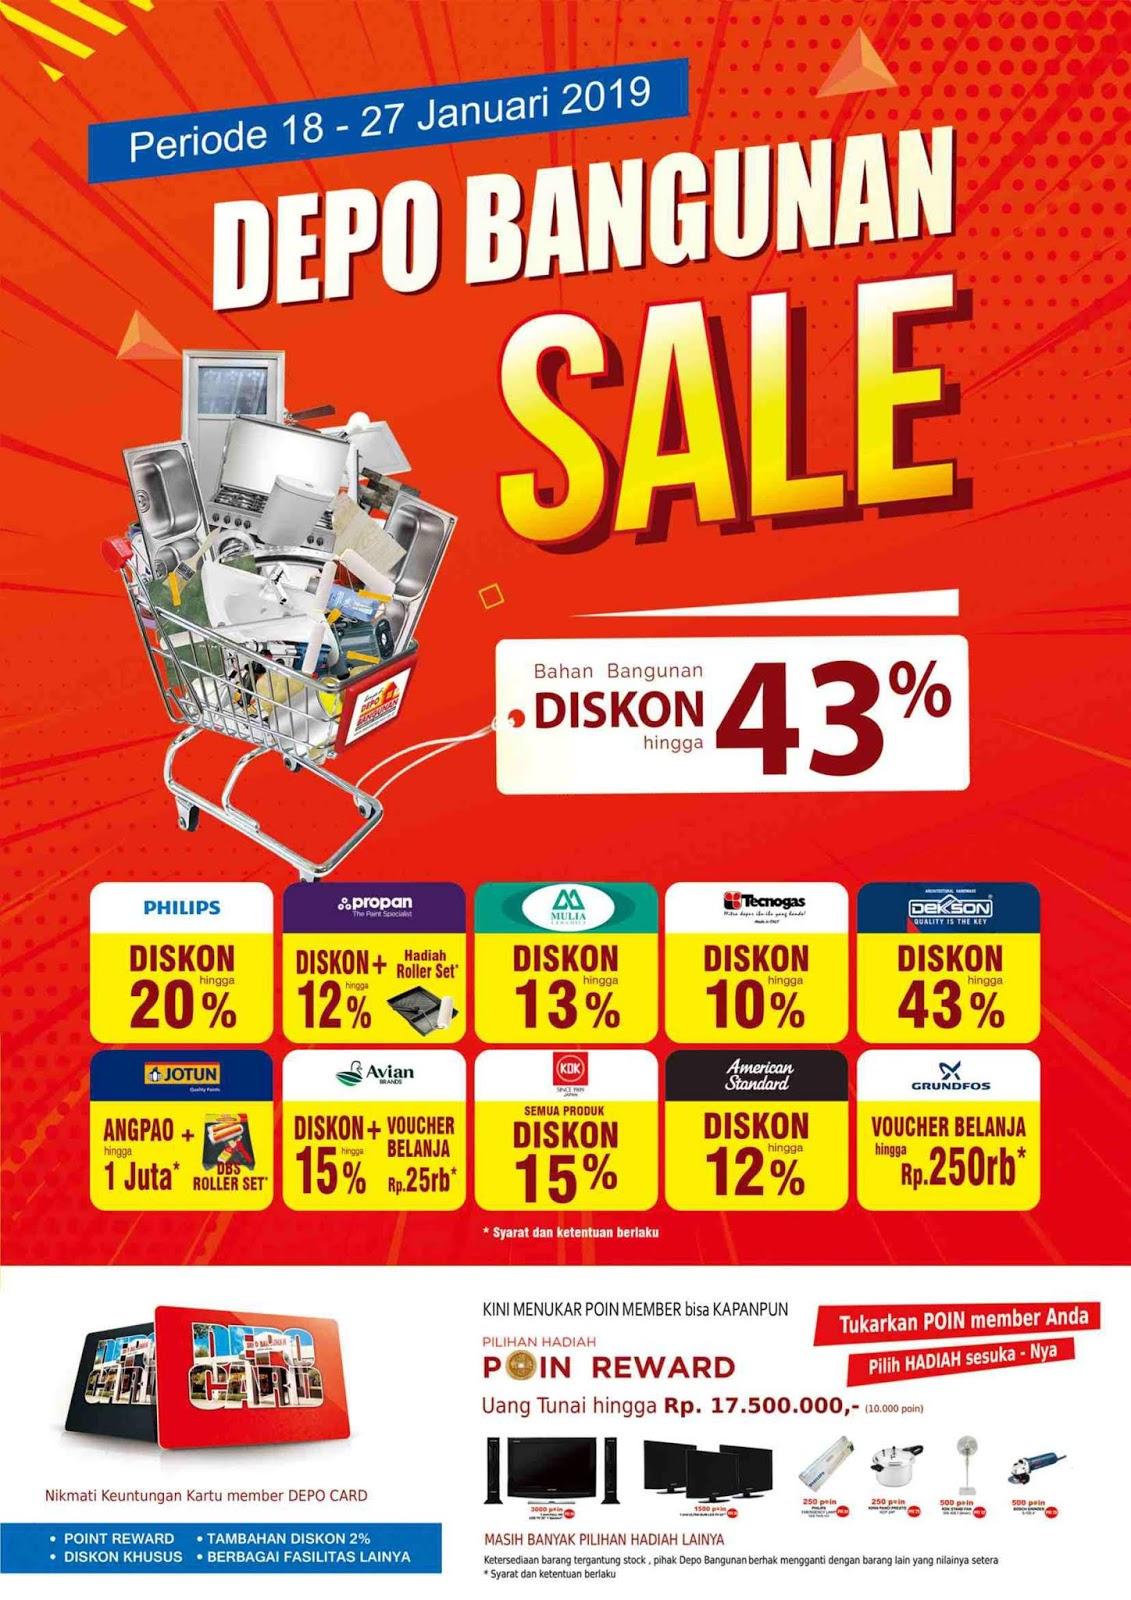 #DepoBangunan - Promo Depo Bangunan Sale s.d 43% Periode 18 - 27 Januari 2019